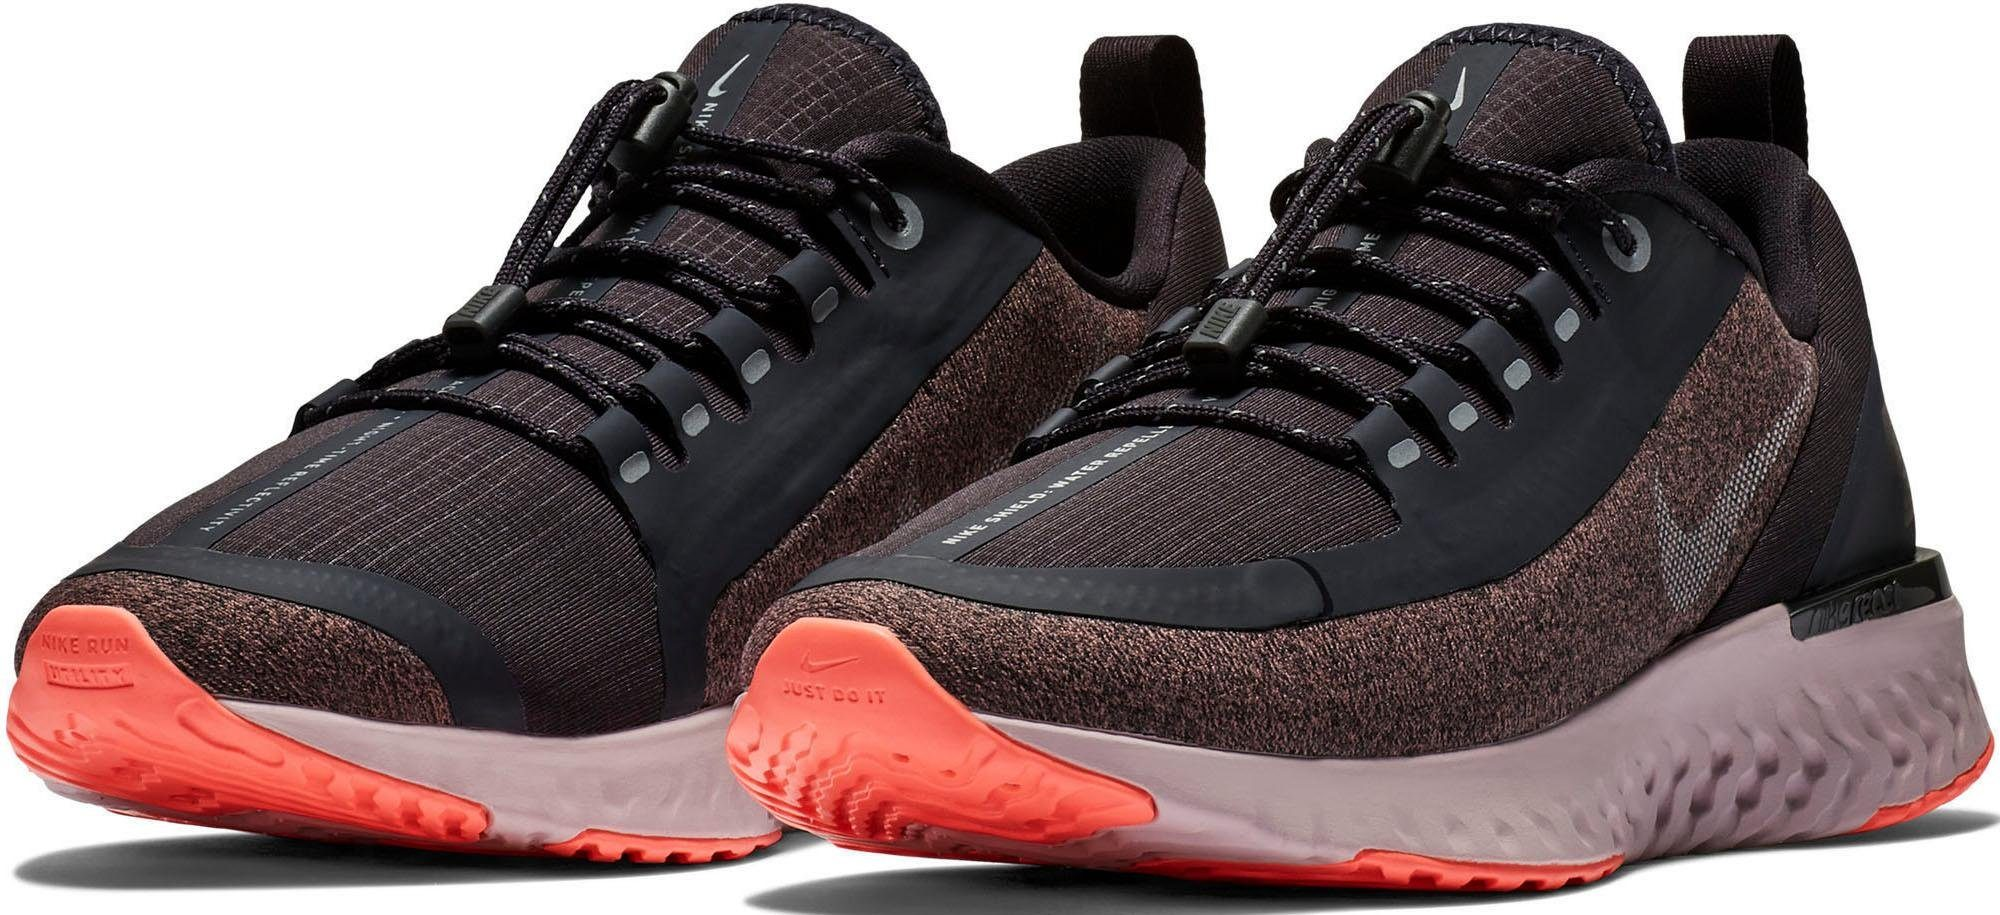 Nike »Wmns Odyssey React Shield« Laufschuh